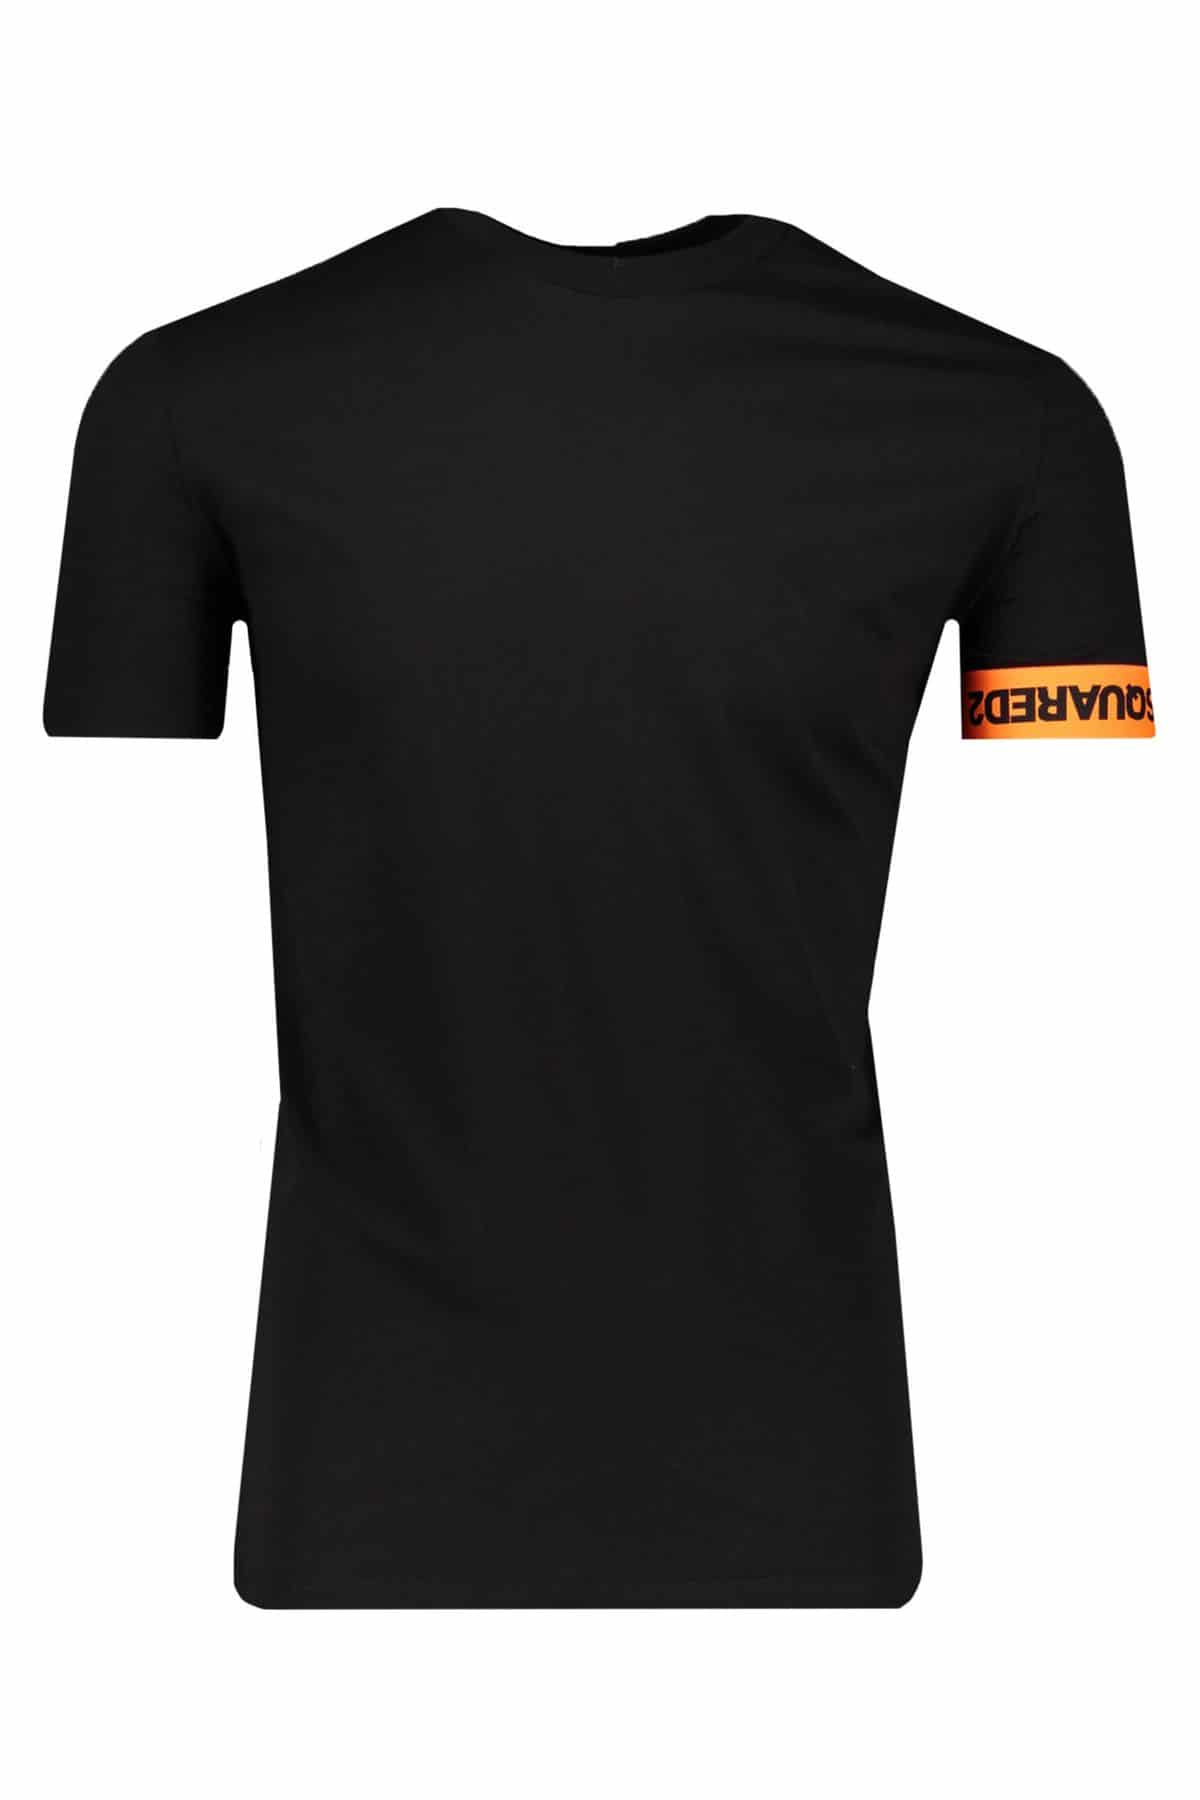 Dsquared2 Round Neck T-Shirt Black